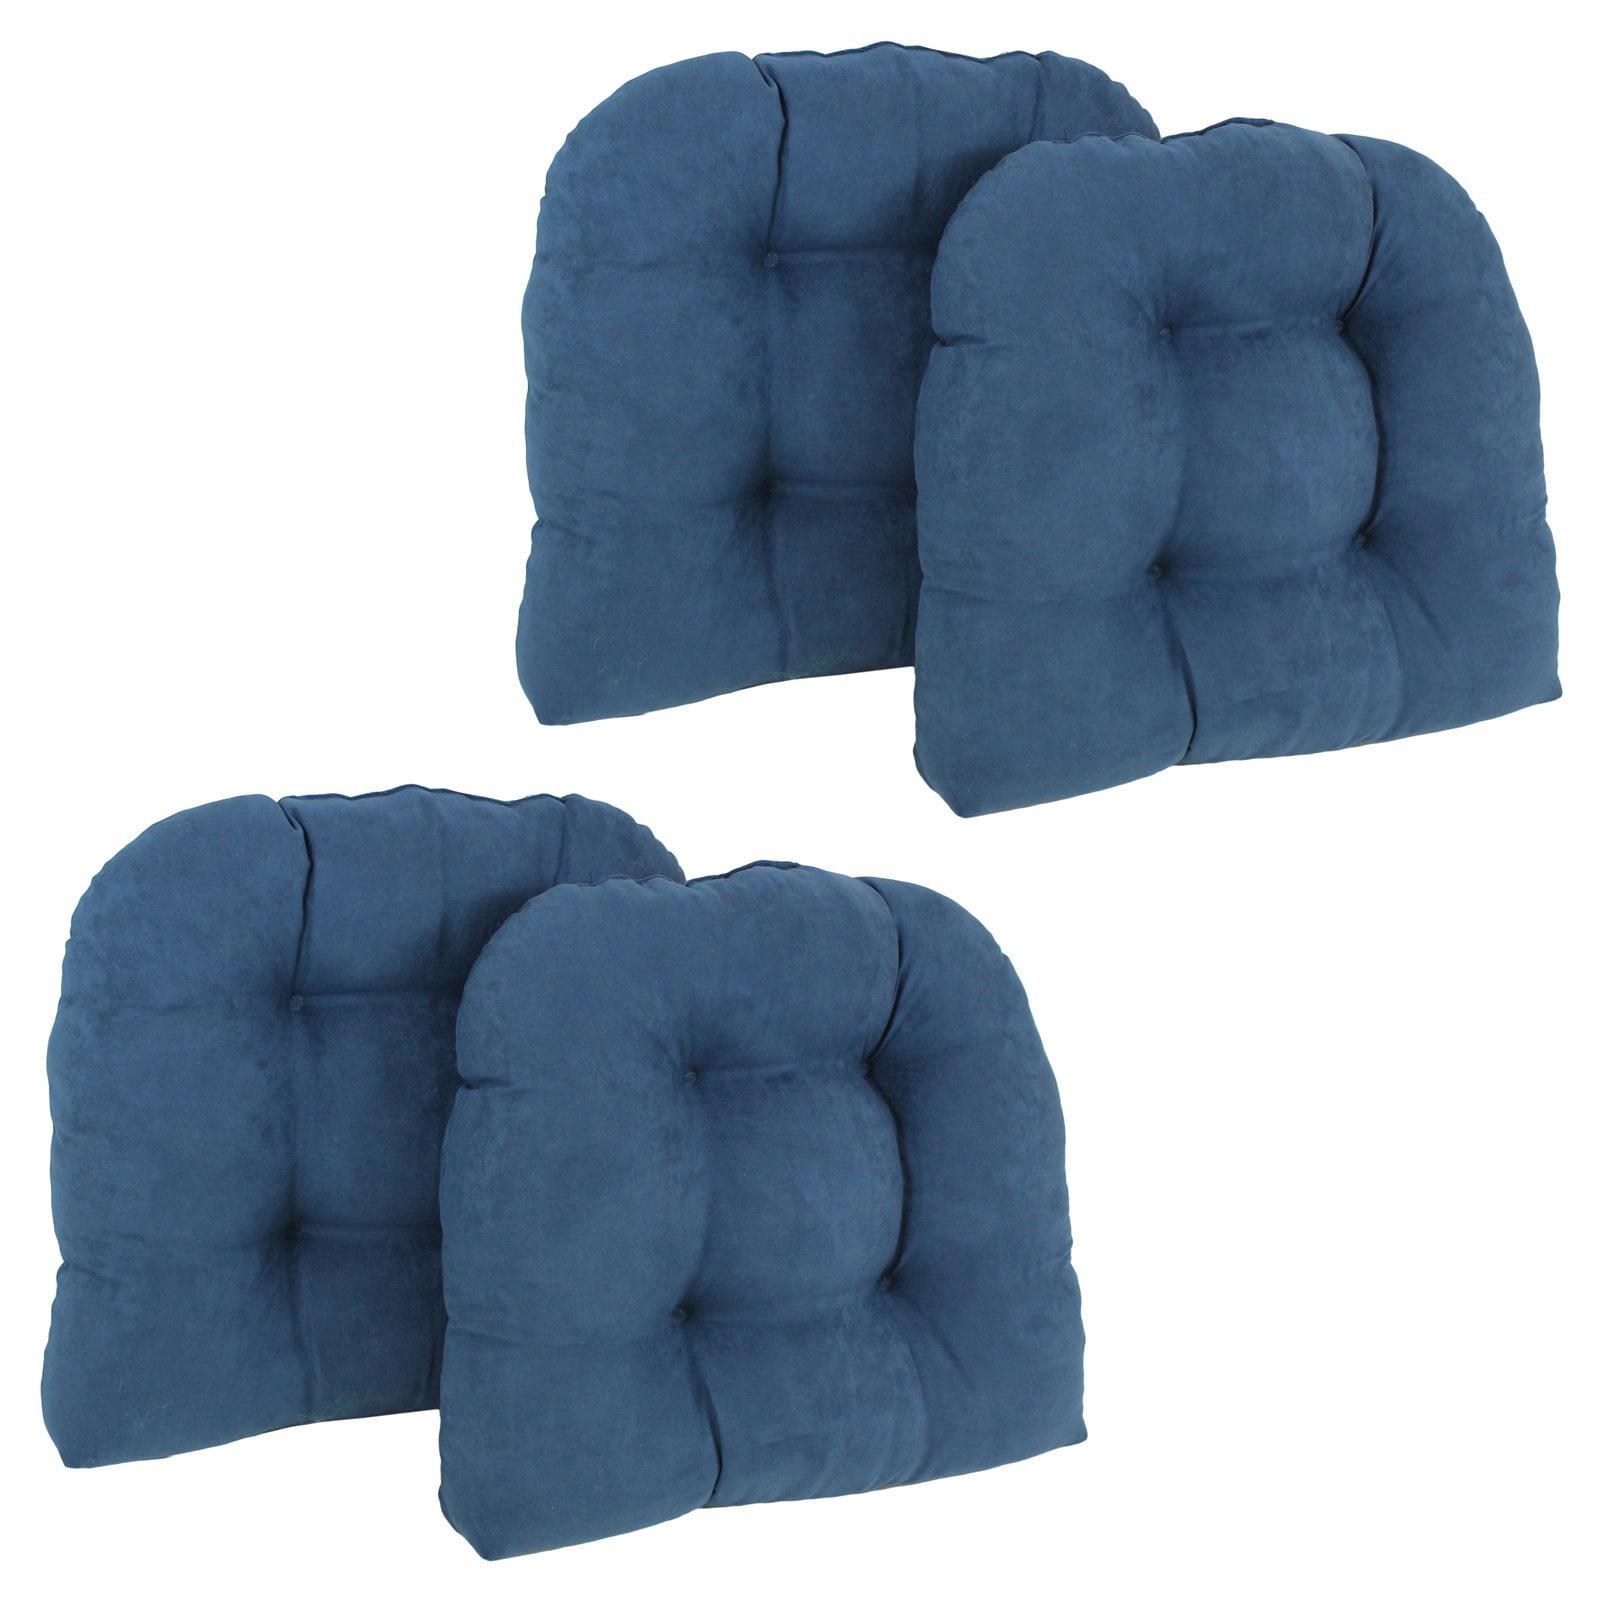 Blazing Needles Microsuede U Shaped Indoor Chair Cushion - Set of 4